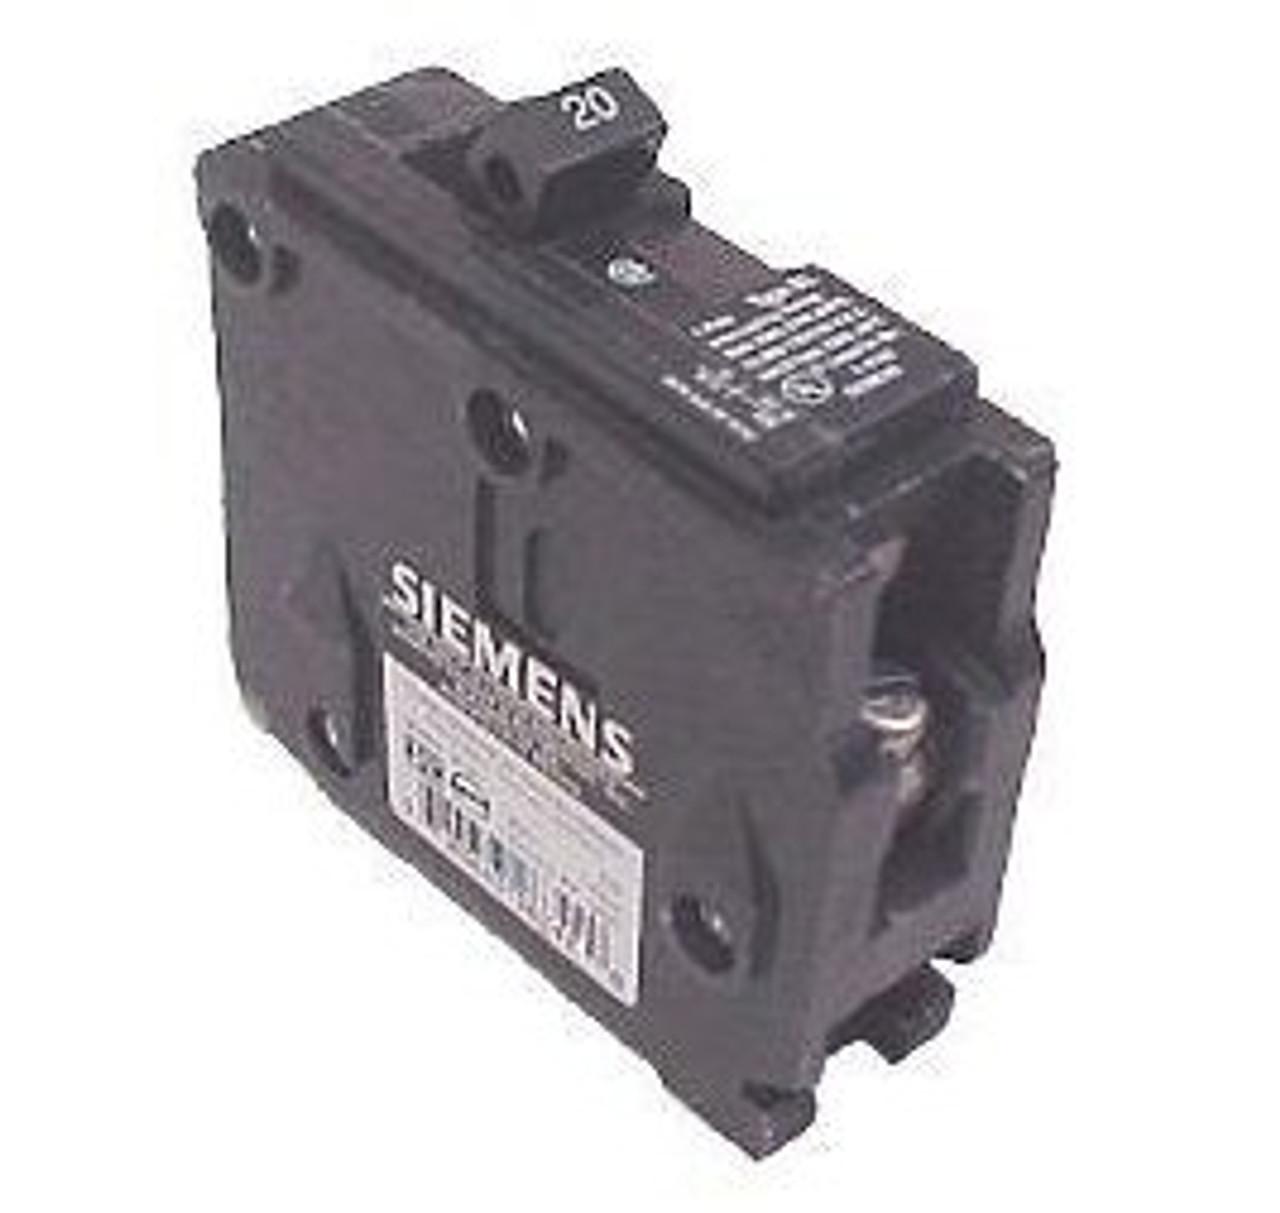 Siemens B130 1 Pole 30 Amp 120VAC Type BL Circuit Breaker - NPO